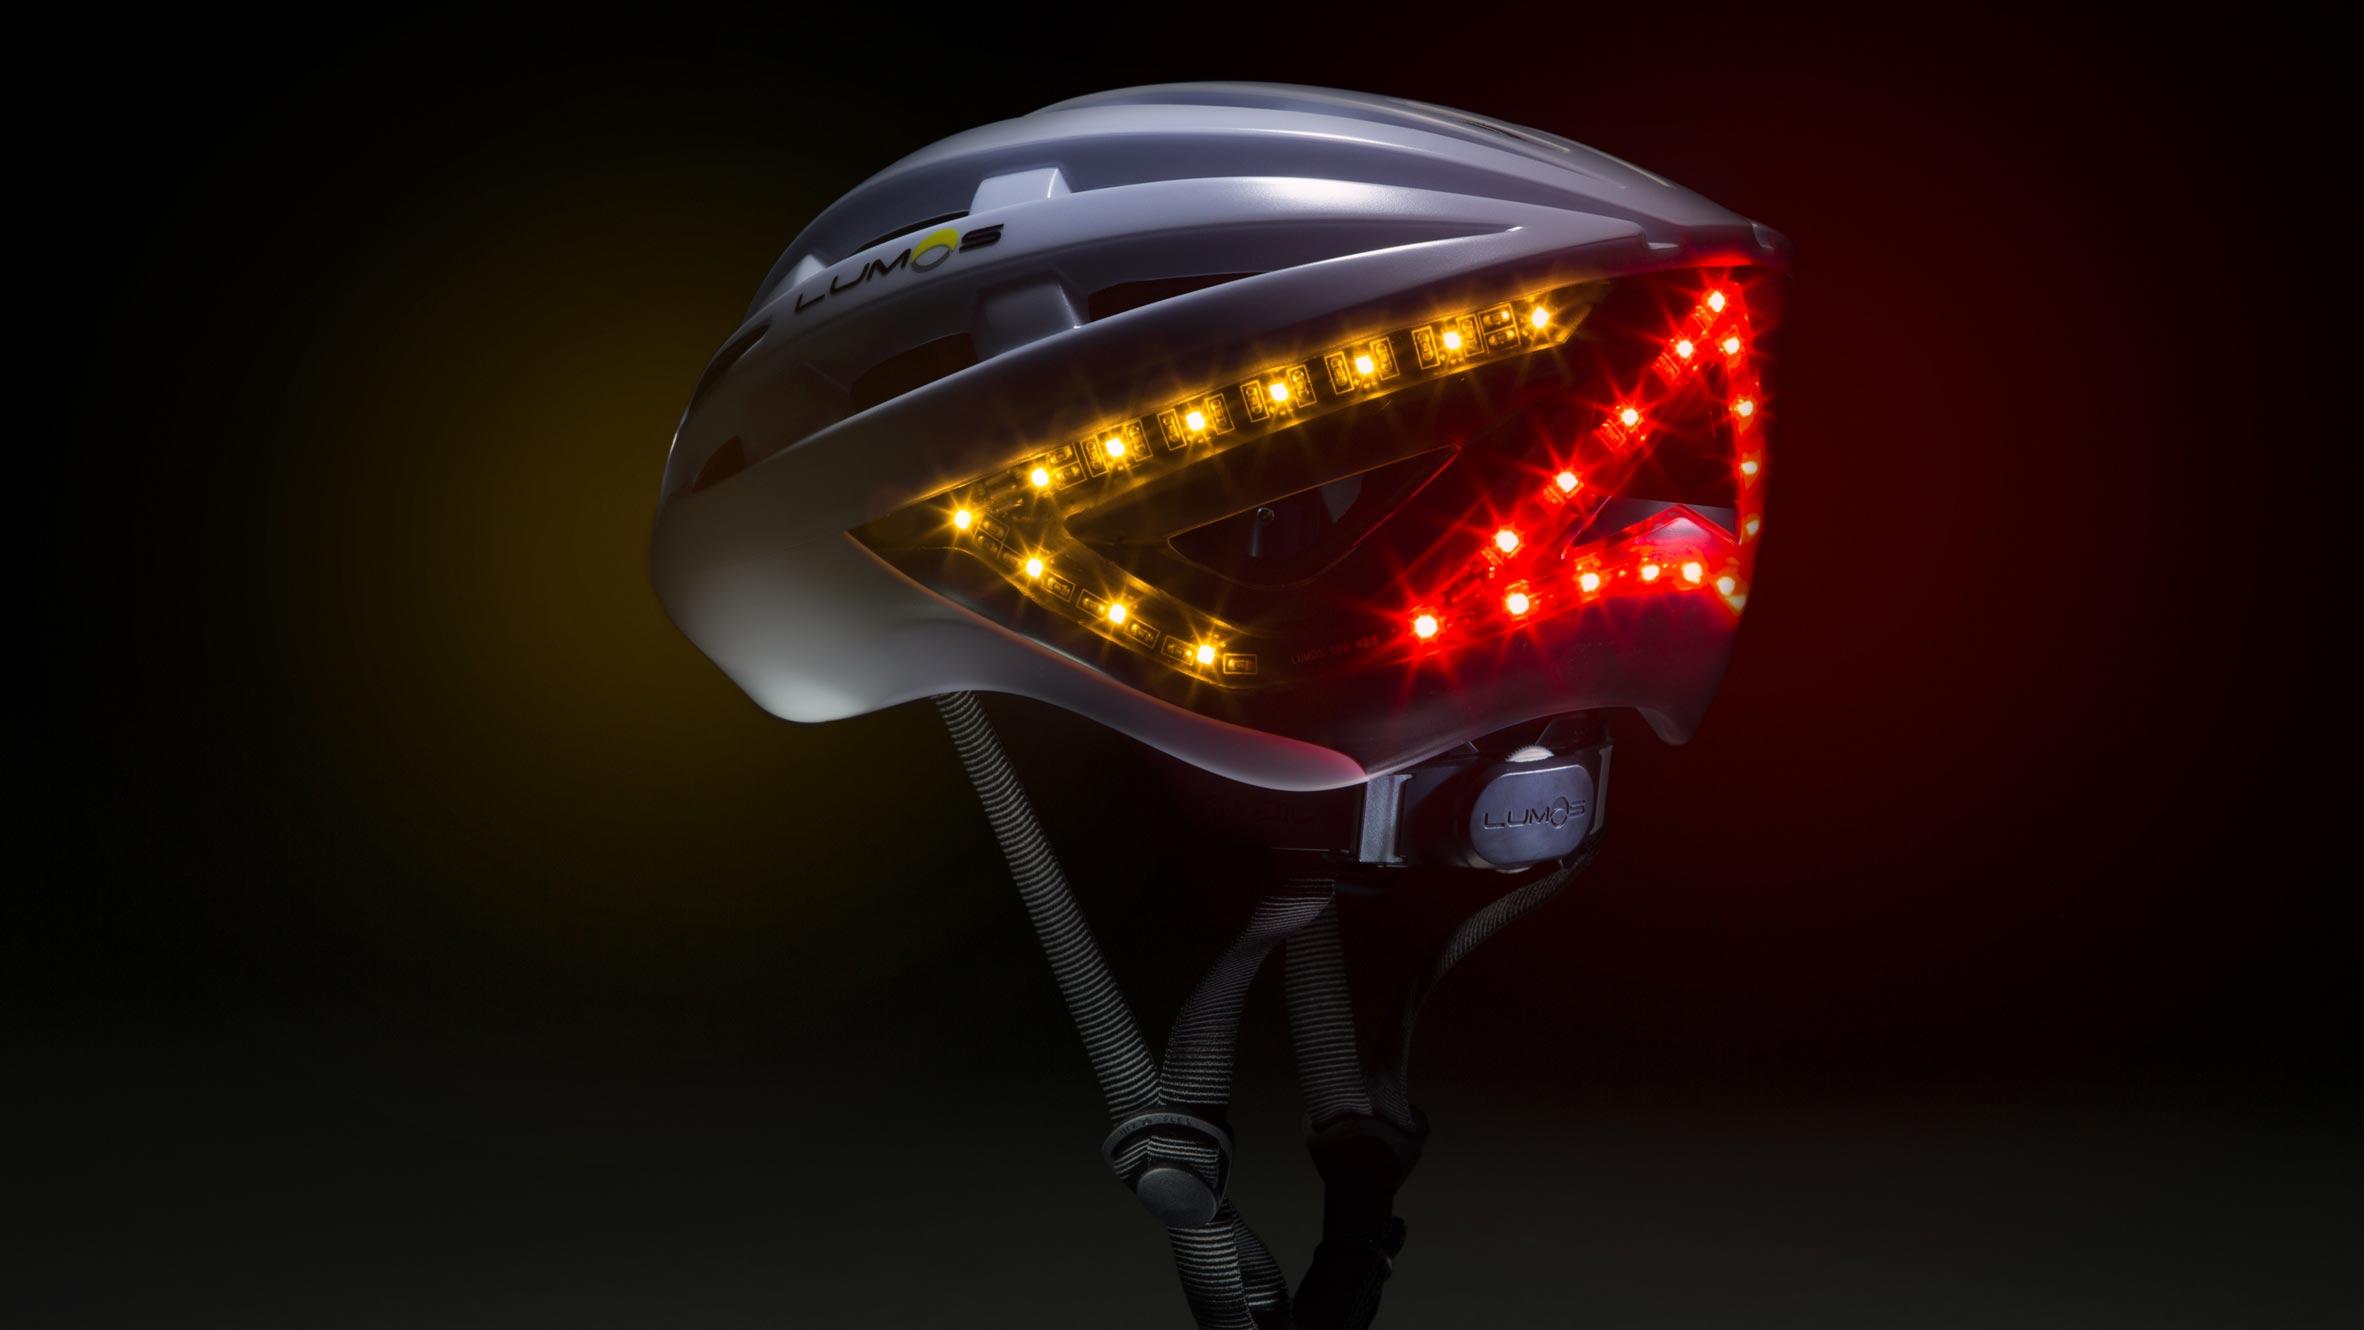 Apple's New smart bike helmet with an LED turn signal